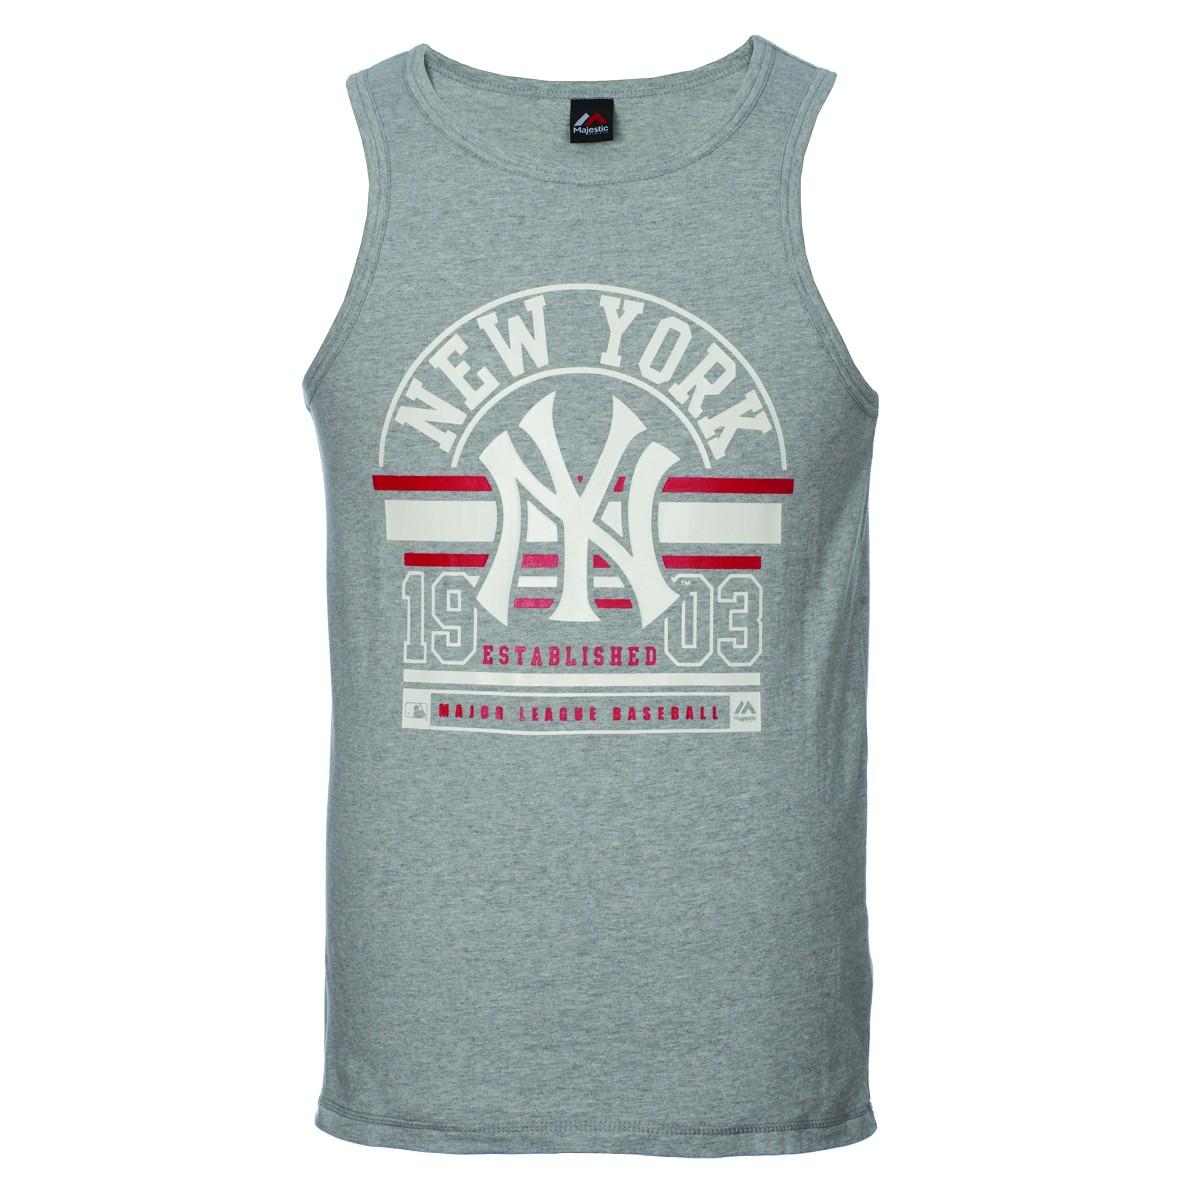 Tshirt Majestic Canotta Kato New York Yankees Maglie